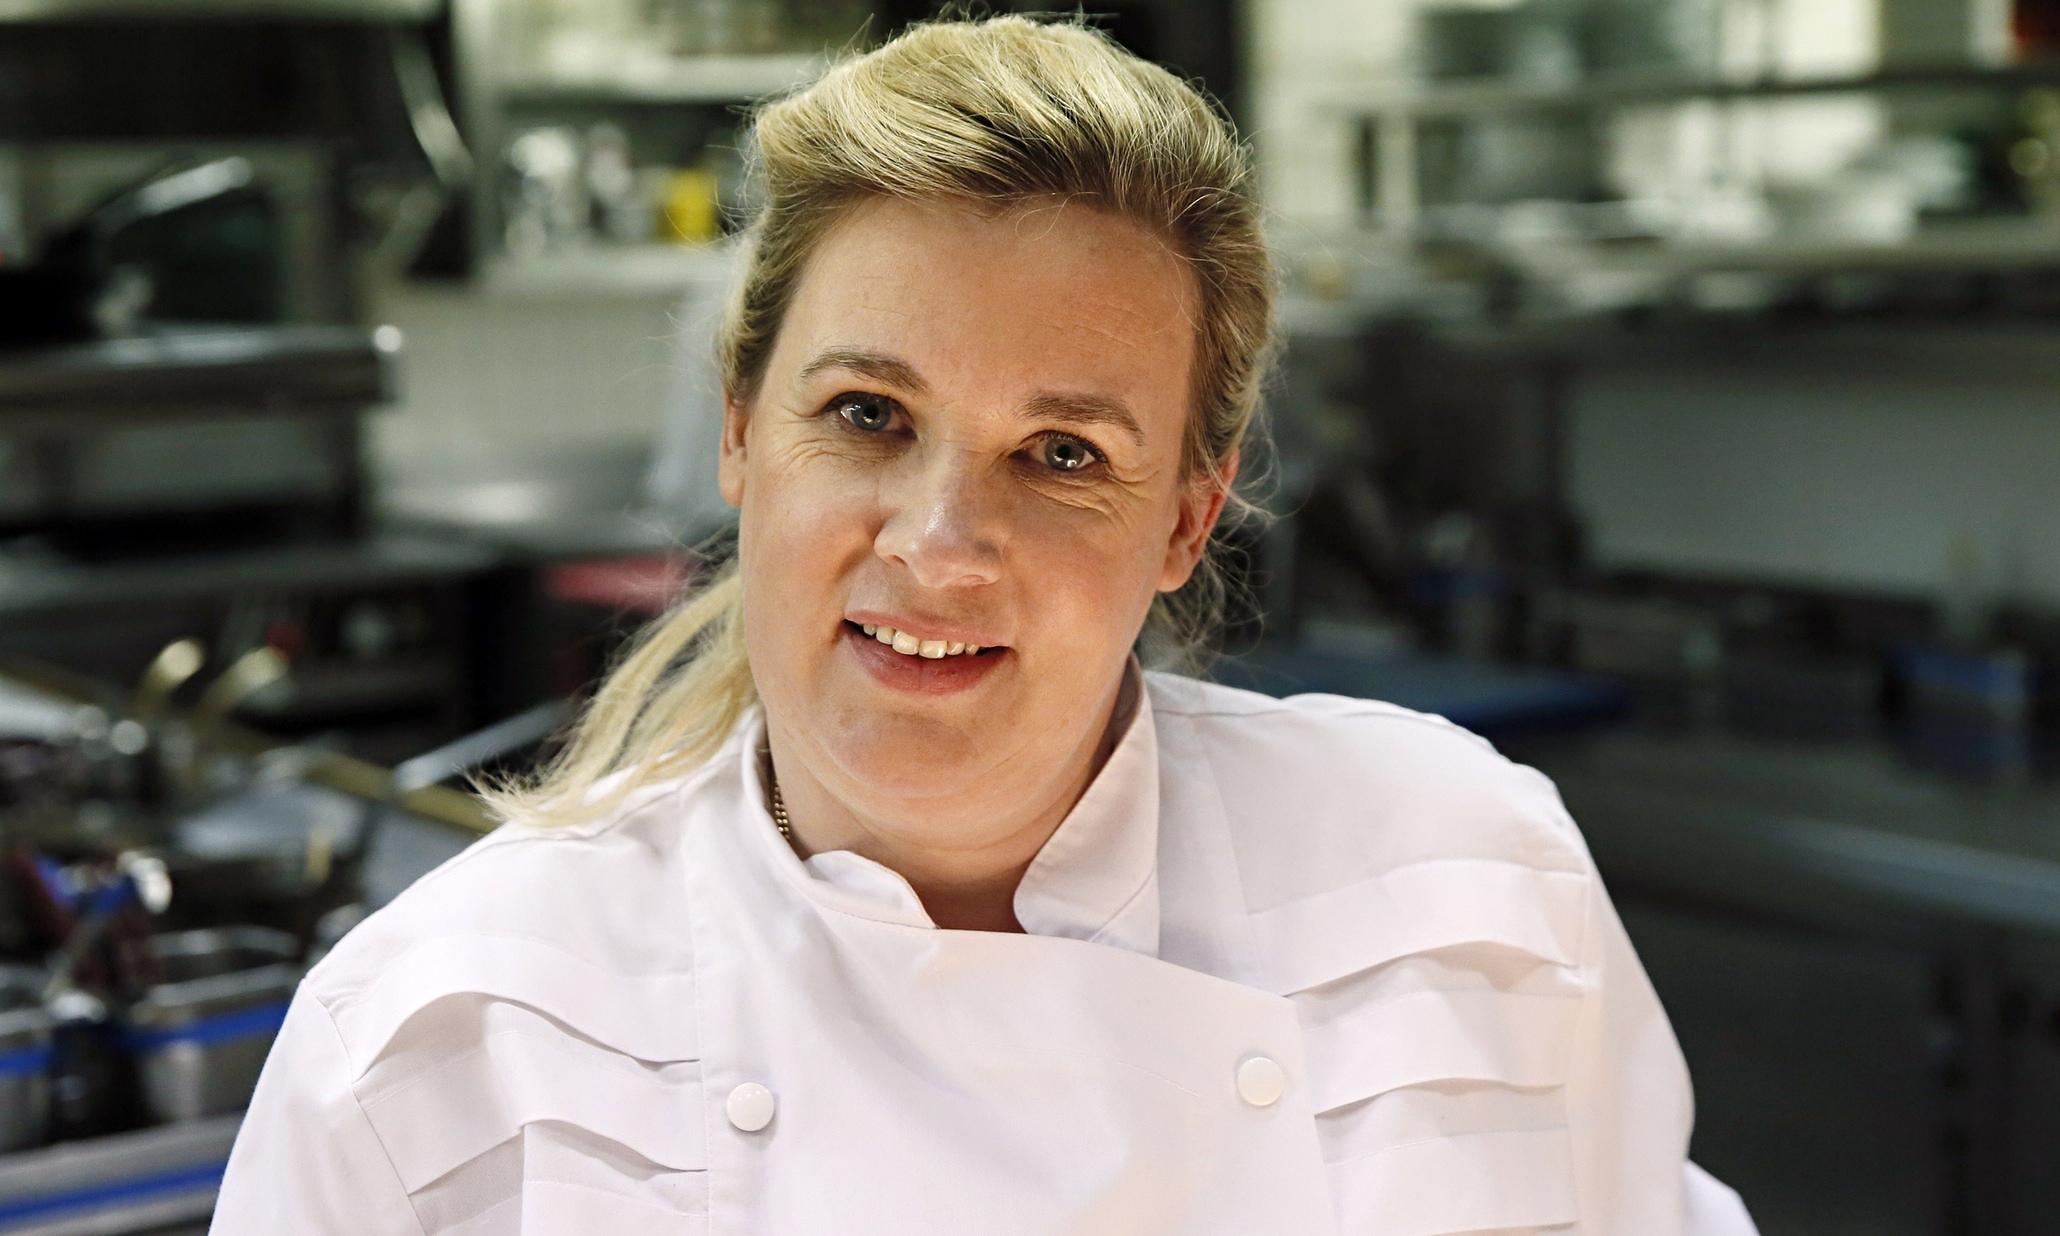 H l ne darroze life according to the world s best female chef life and style the guardian - Helene darroze francis darroze ...